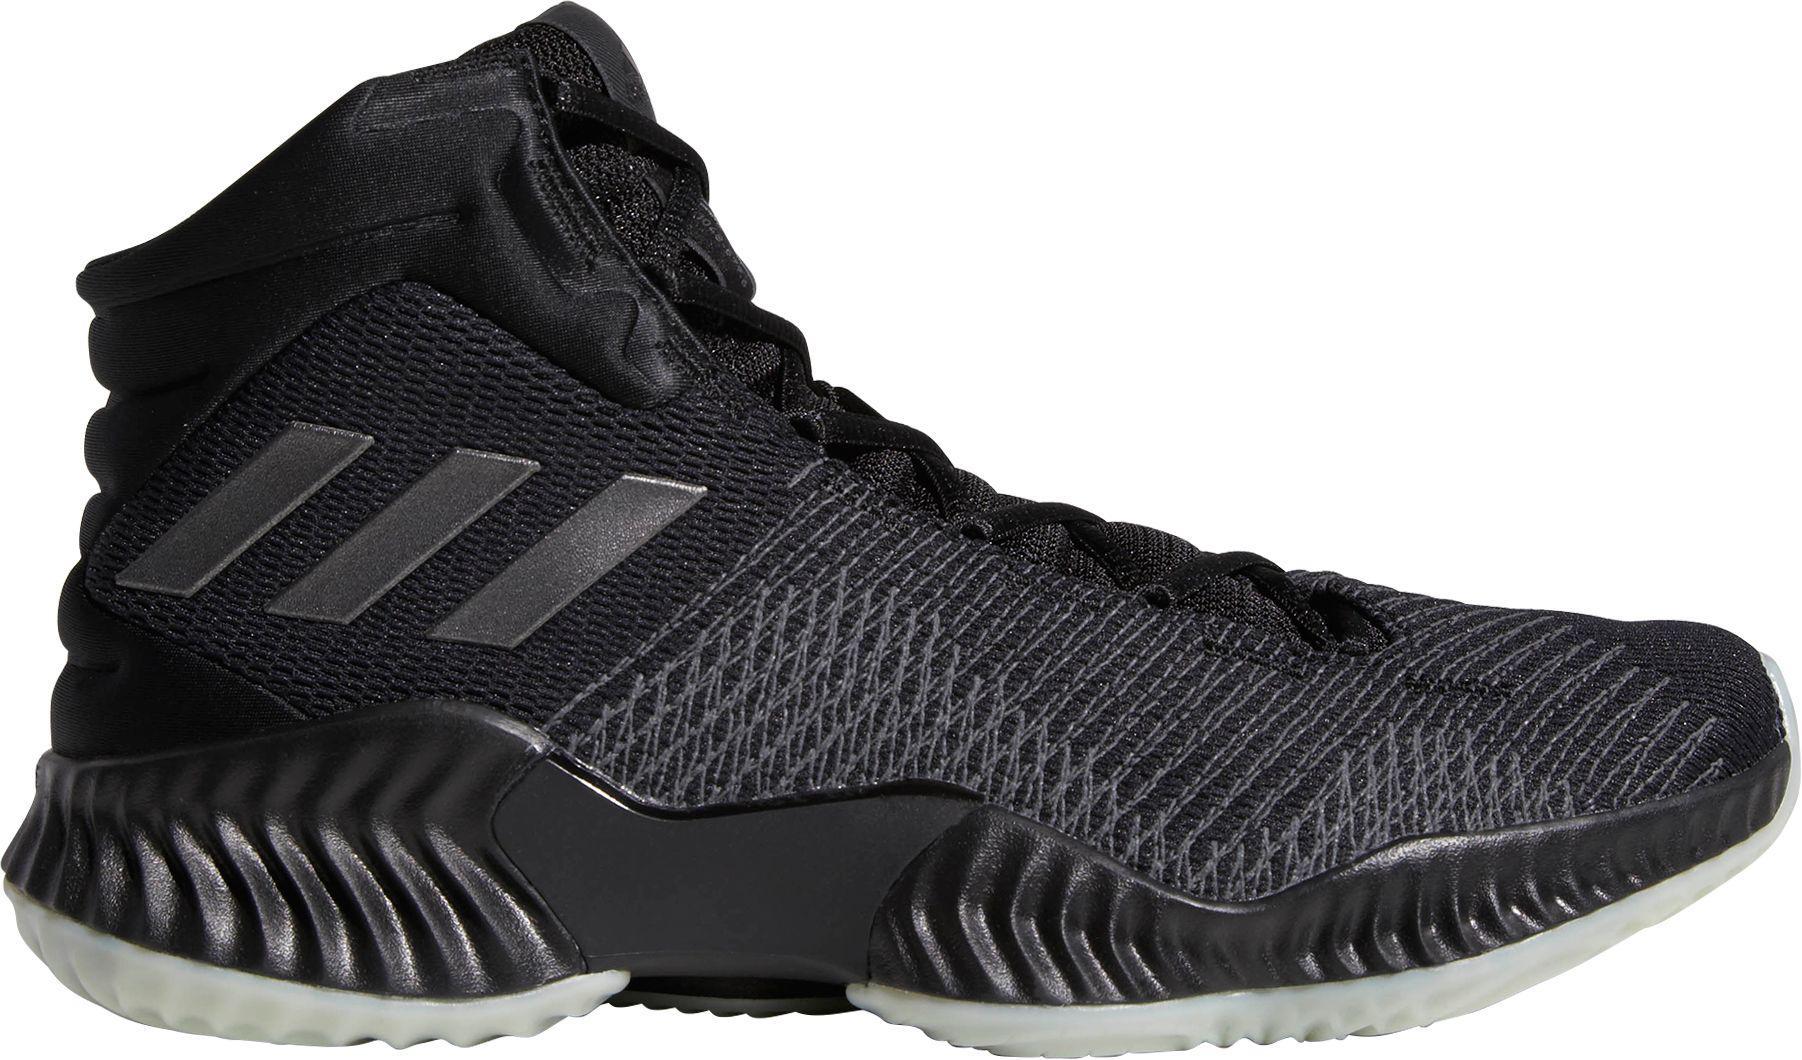 7de2aaeb1 Lyst - adidas Pro Bounce 2018 Basketball Shoes in Black for Men